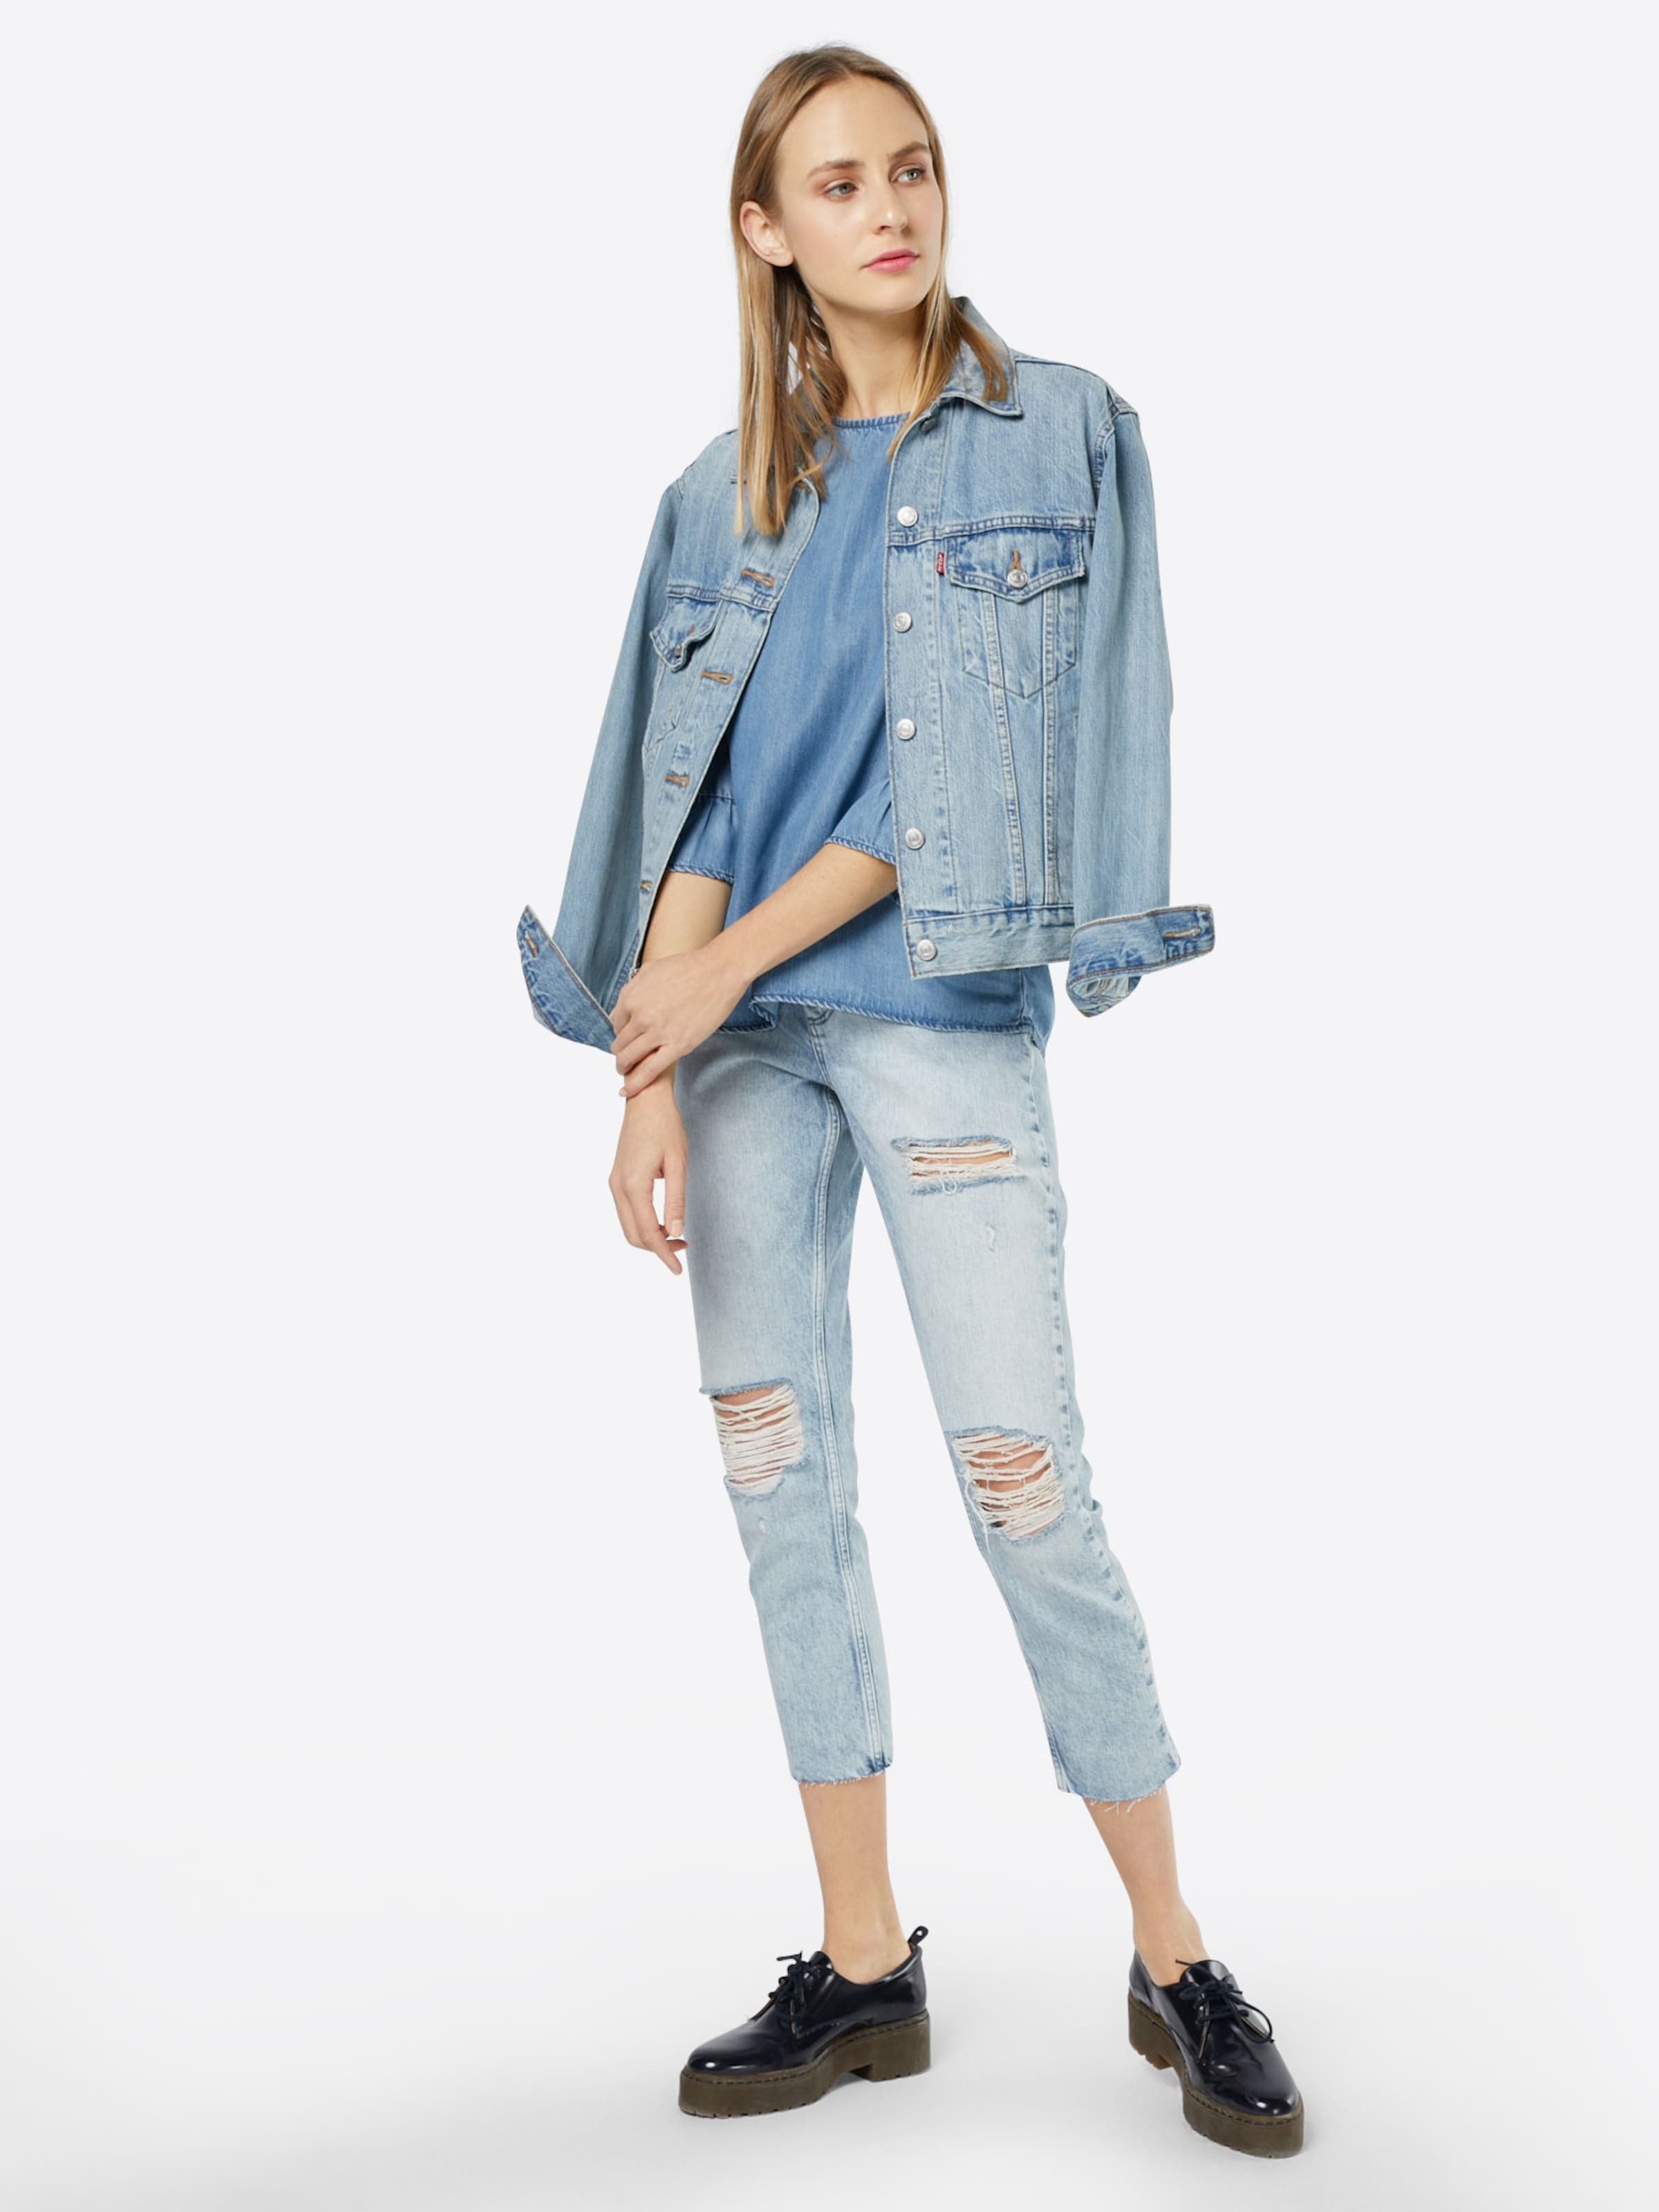 Jeans ONLY 'KELLY' 'KELLY' ONLY Jeans Jeans ONLY 'KELLY' Jeans 'KELLY' ONLY OIqxTEwXx